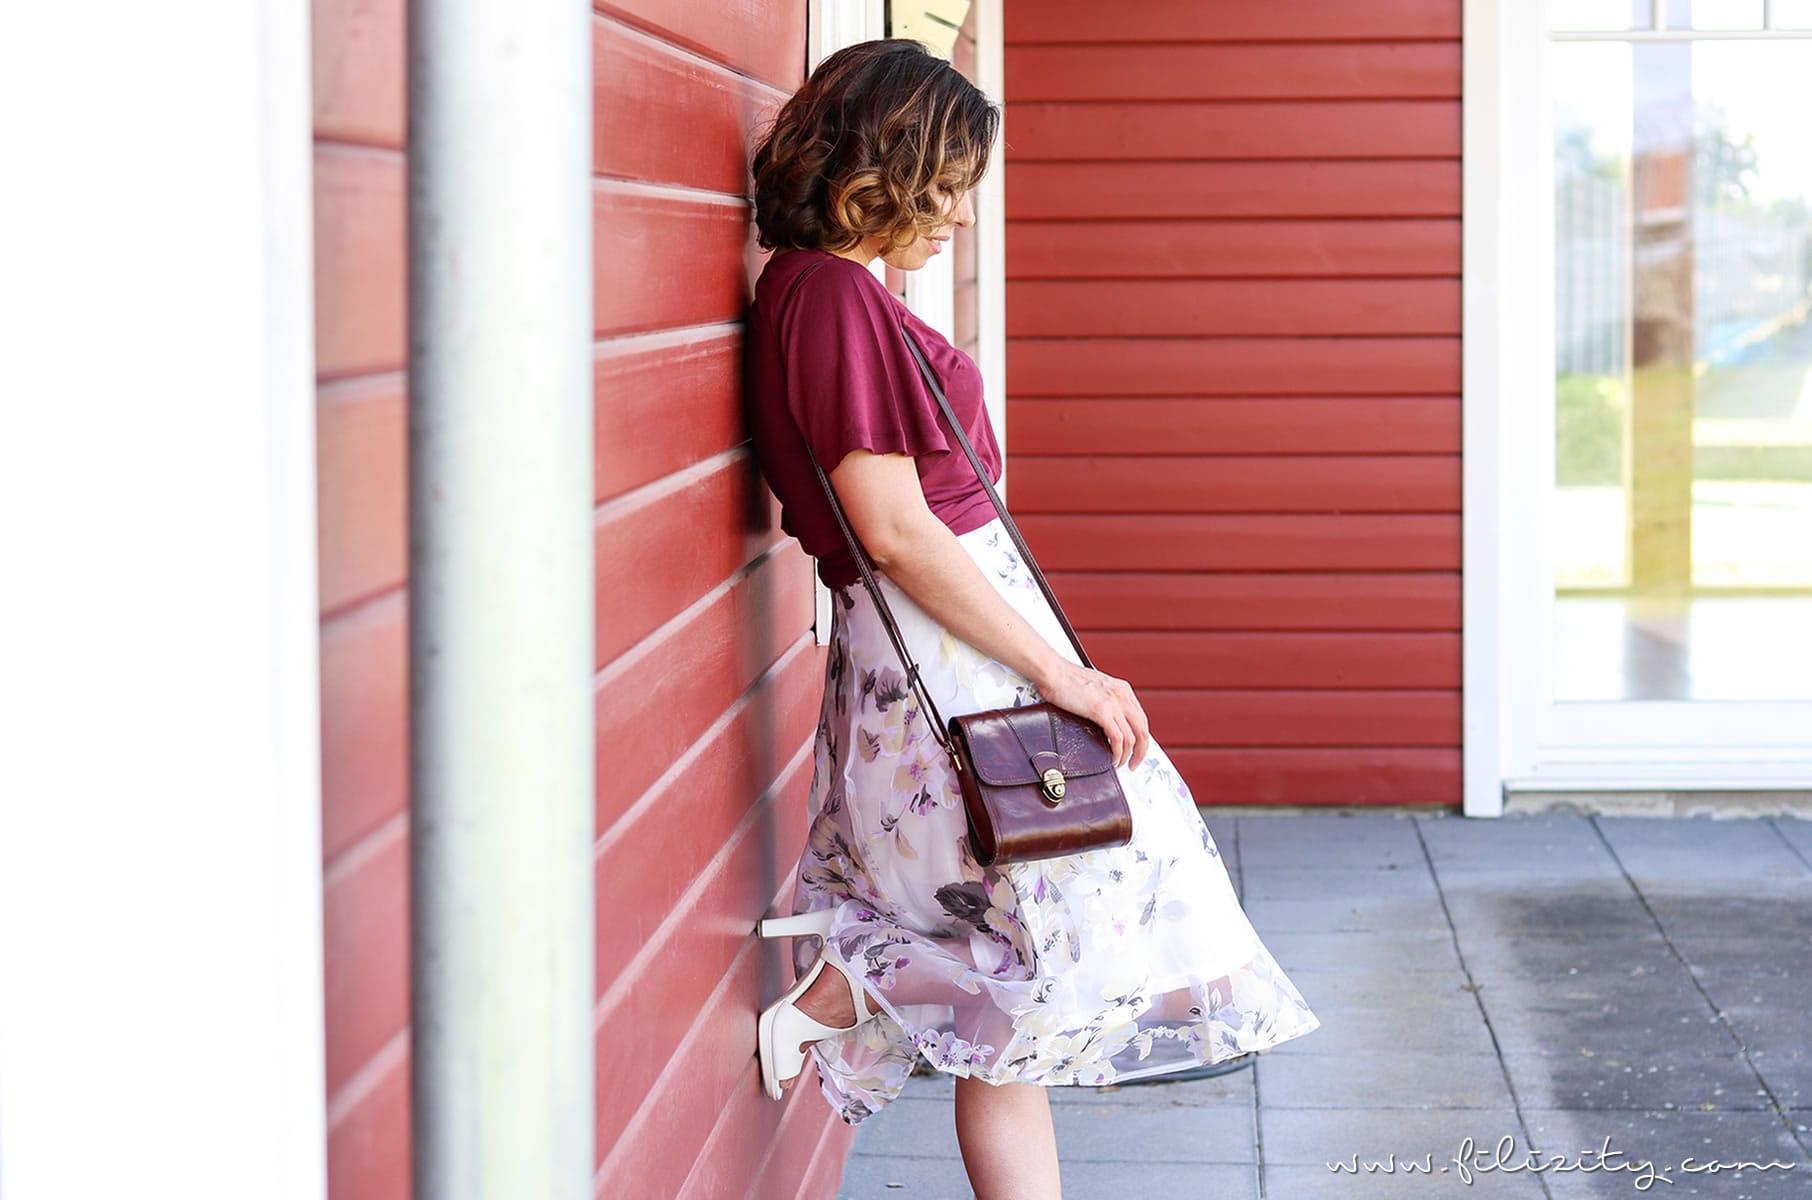 Sommer-Must-Have Blumenmuster - So stylst du den Dauertrend + Outfit